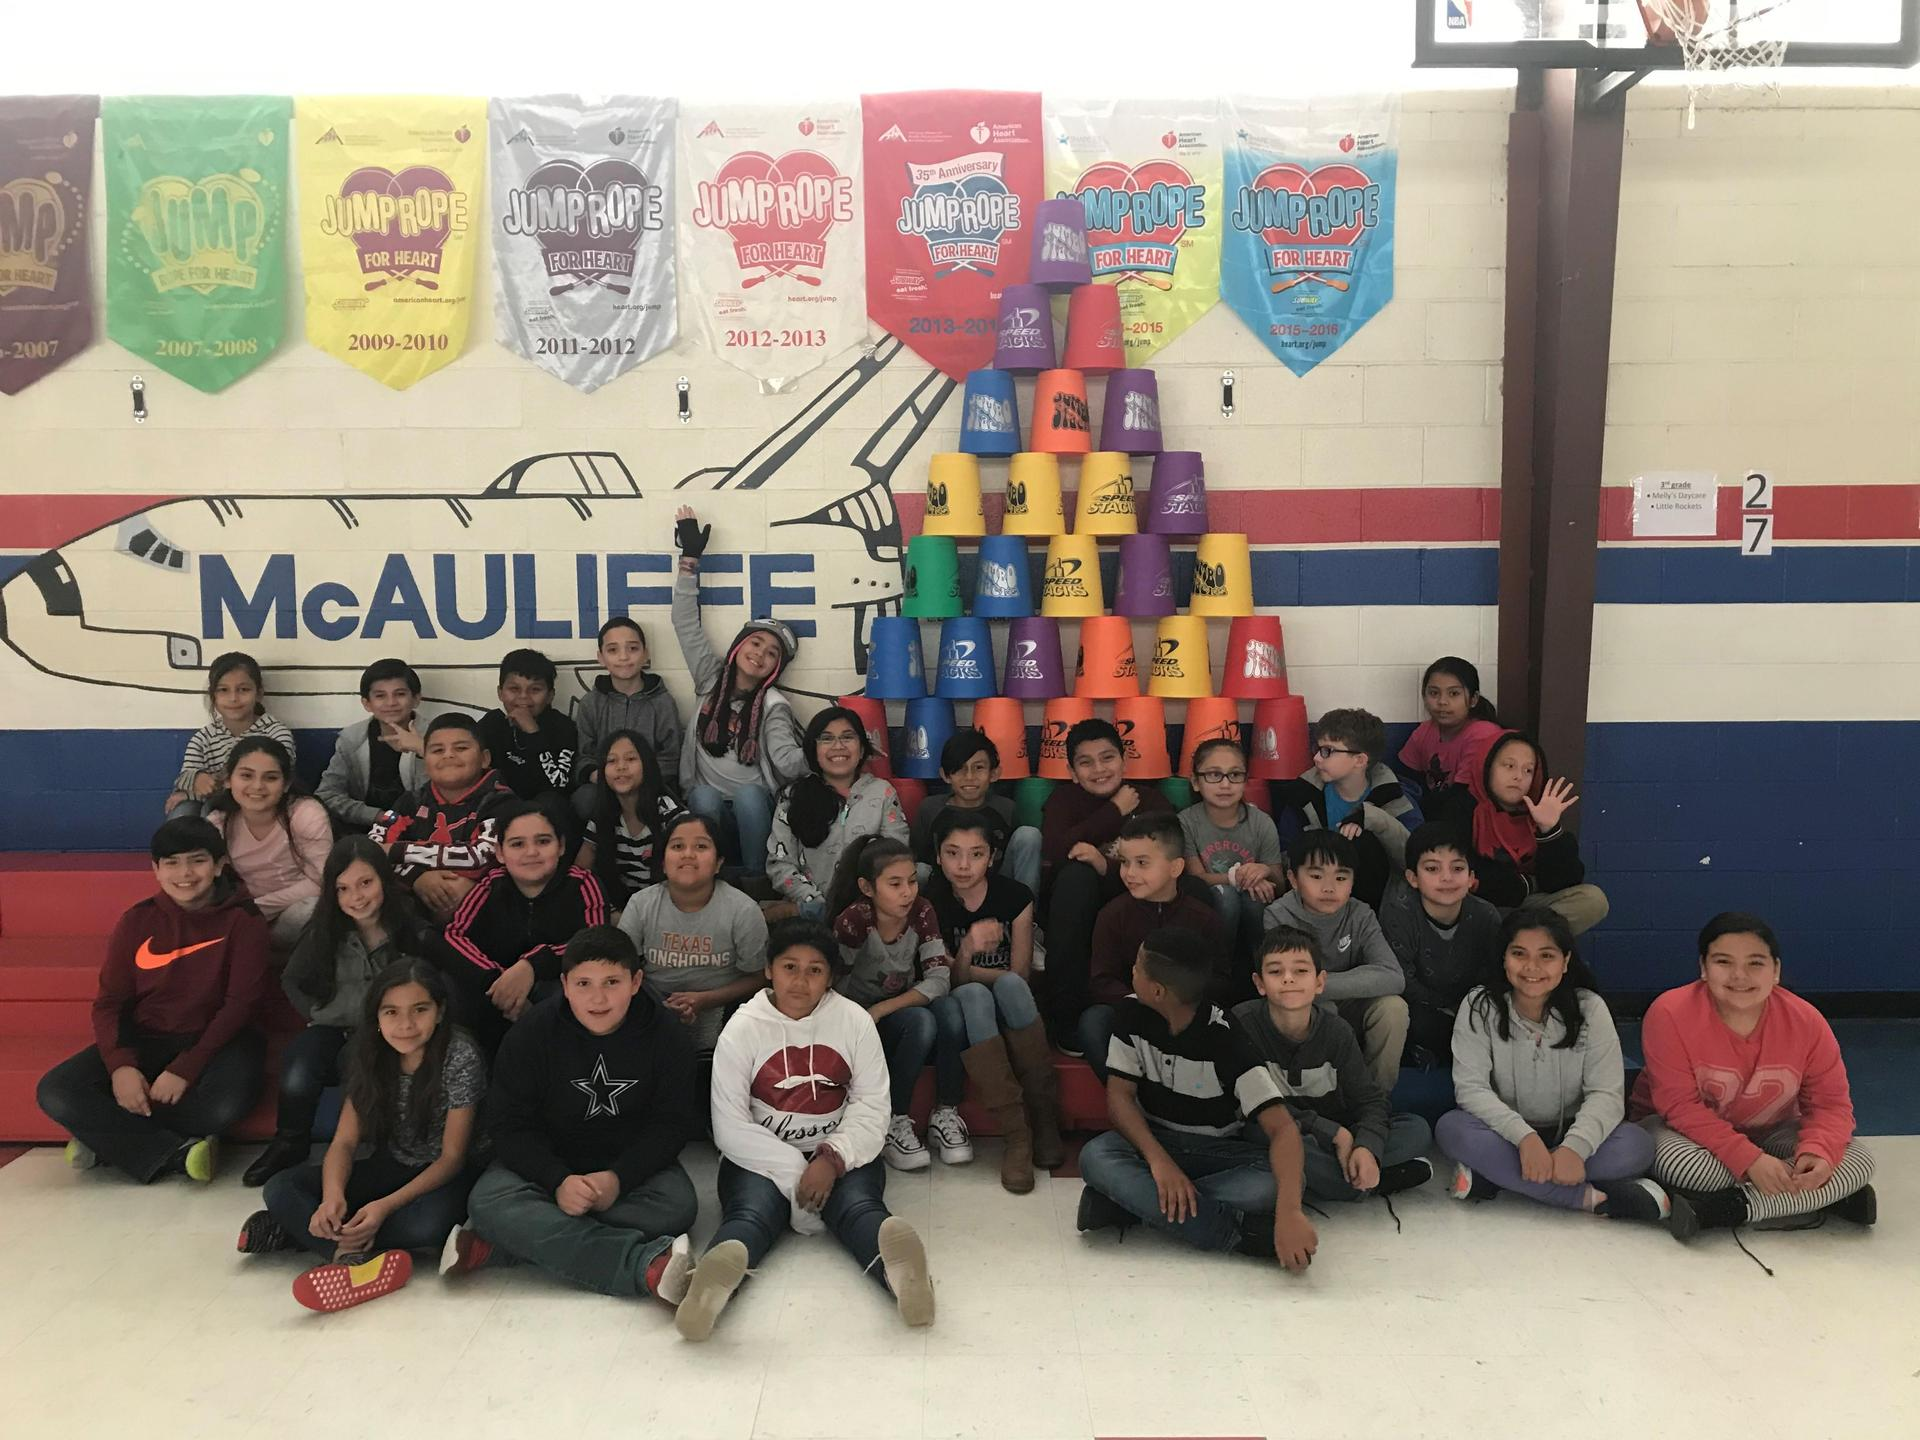 McAuliffe Elementary Cupstacking Fun